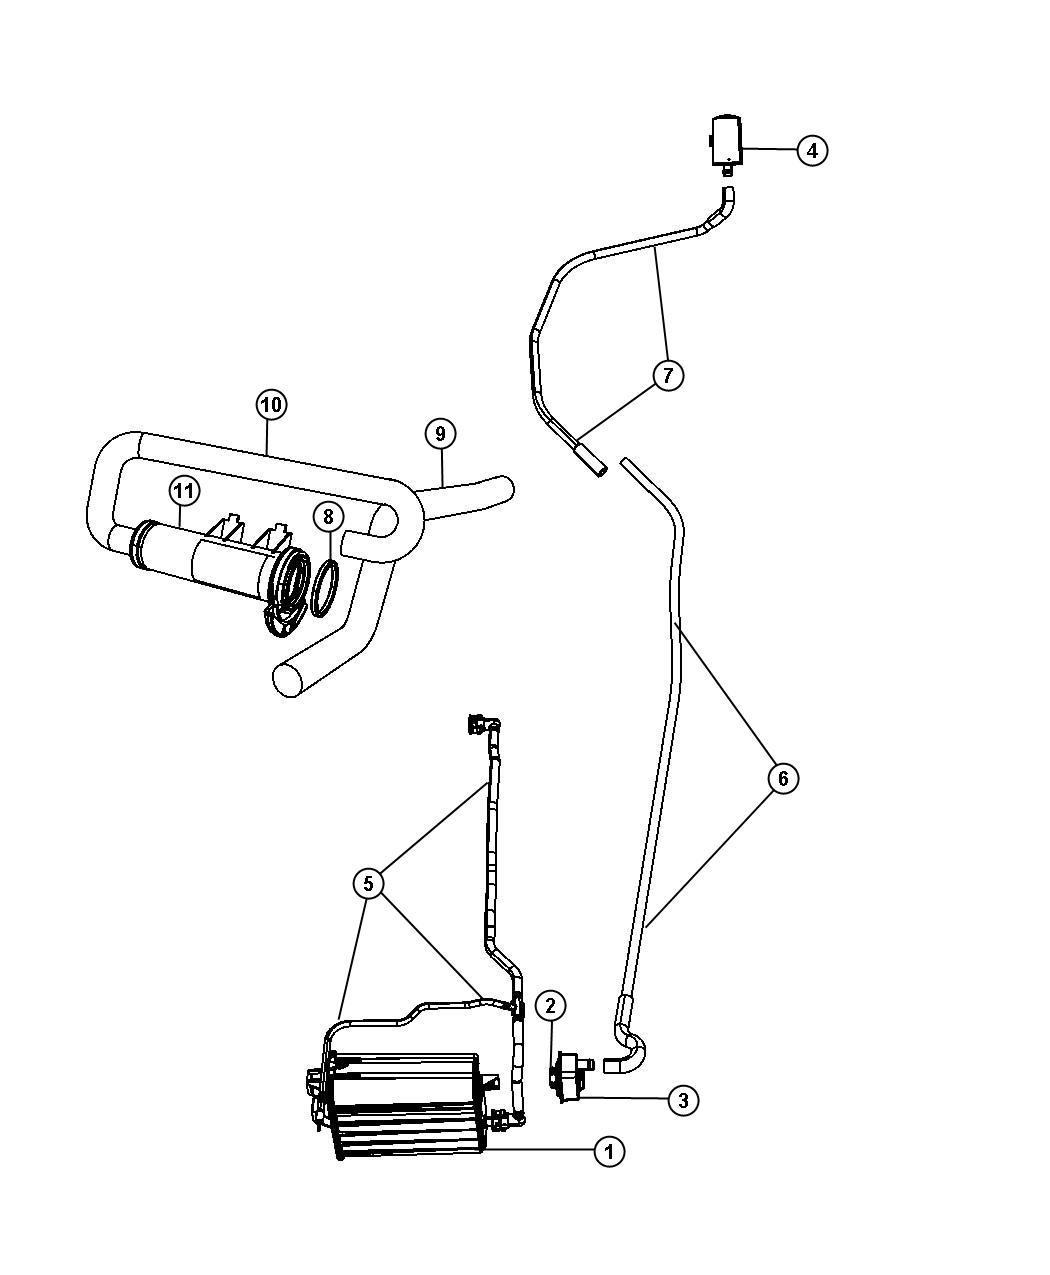 2007 Chrysler Aspen Canister. Vapor. Fuel, detection, pump